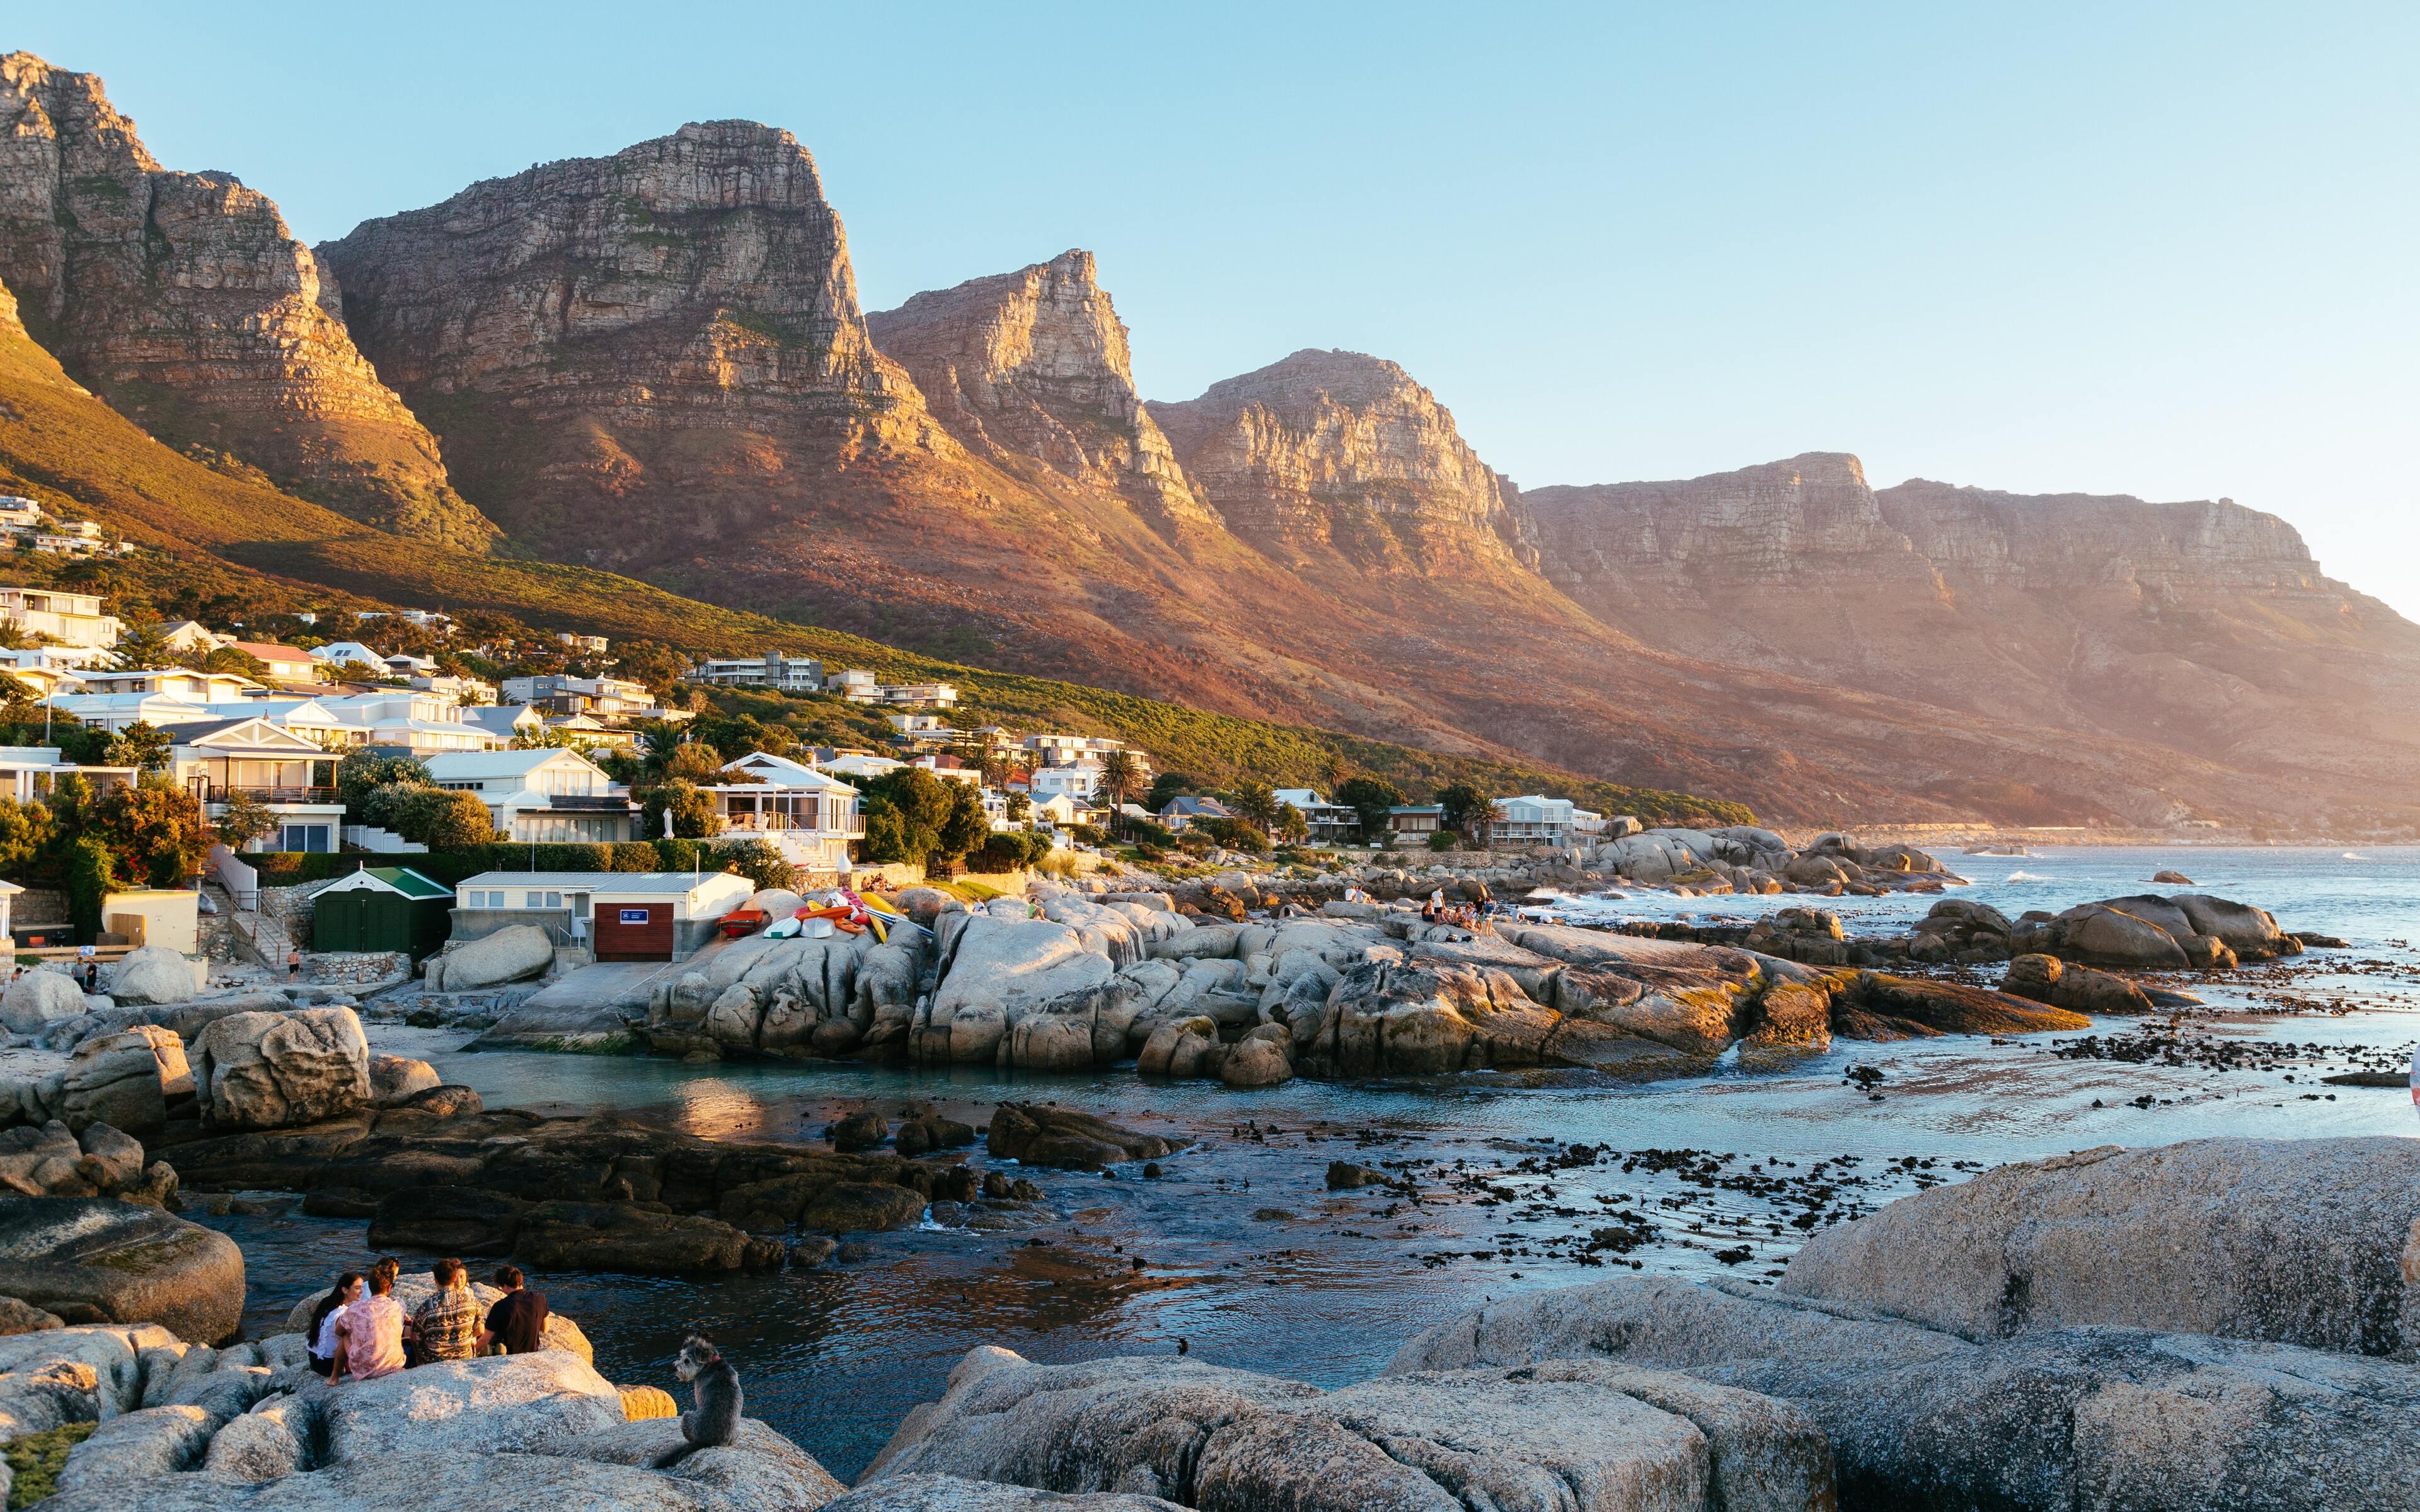 beautiful-town-mountains-landscape-water-body-5k-6s.jpg